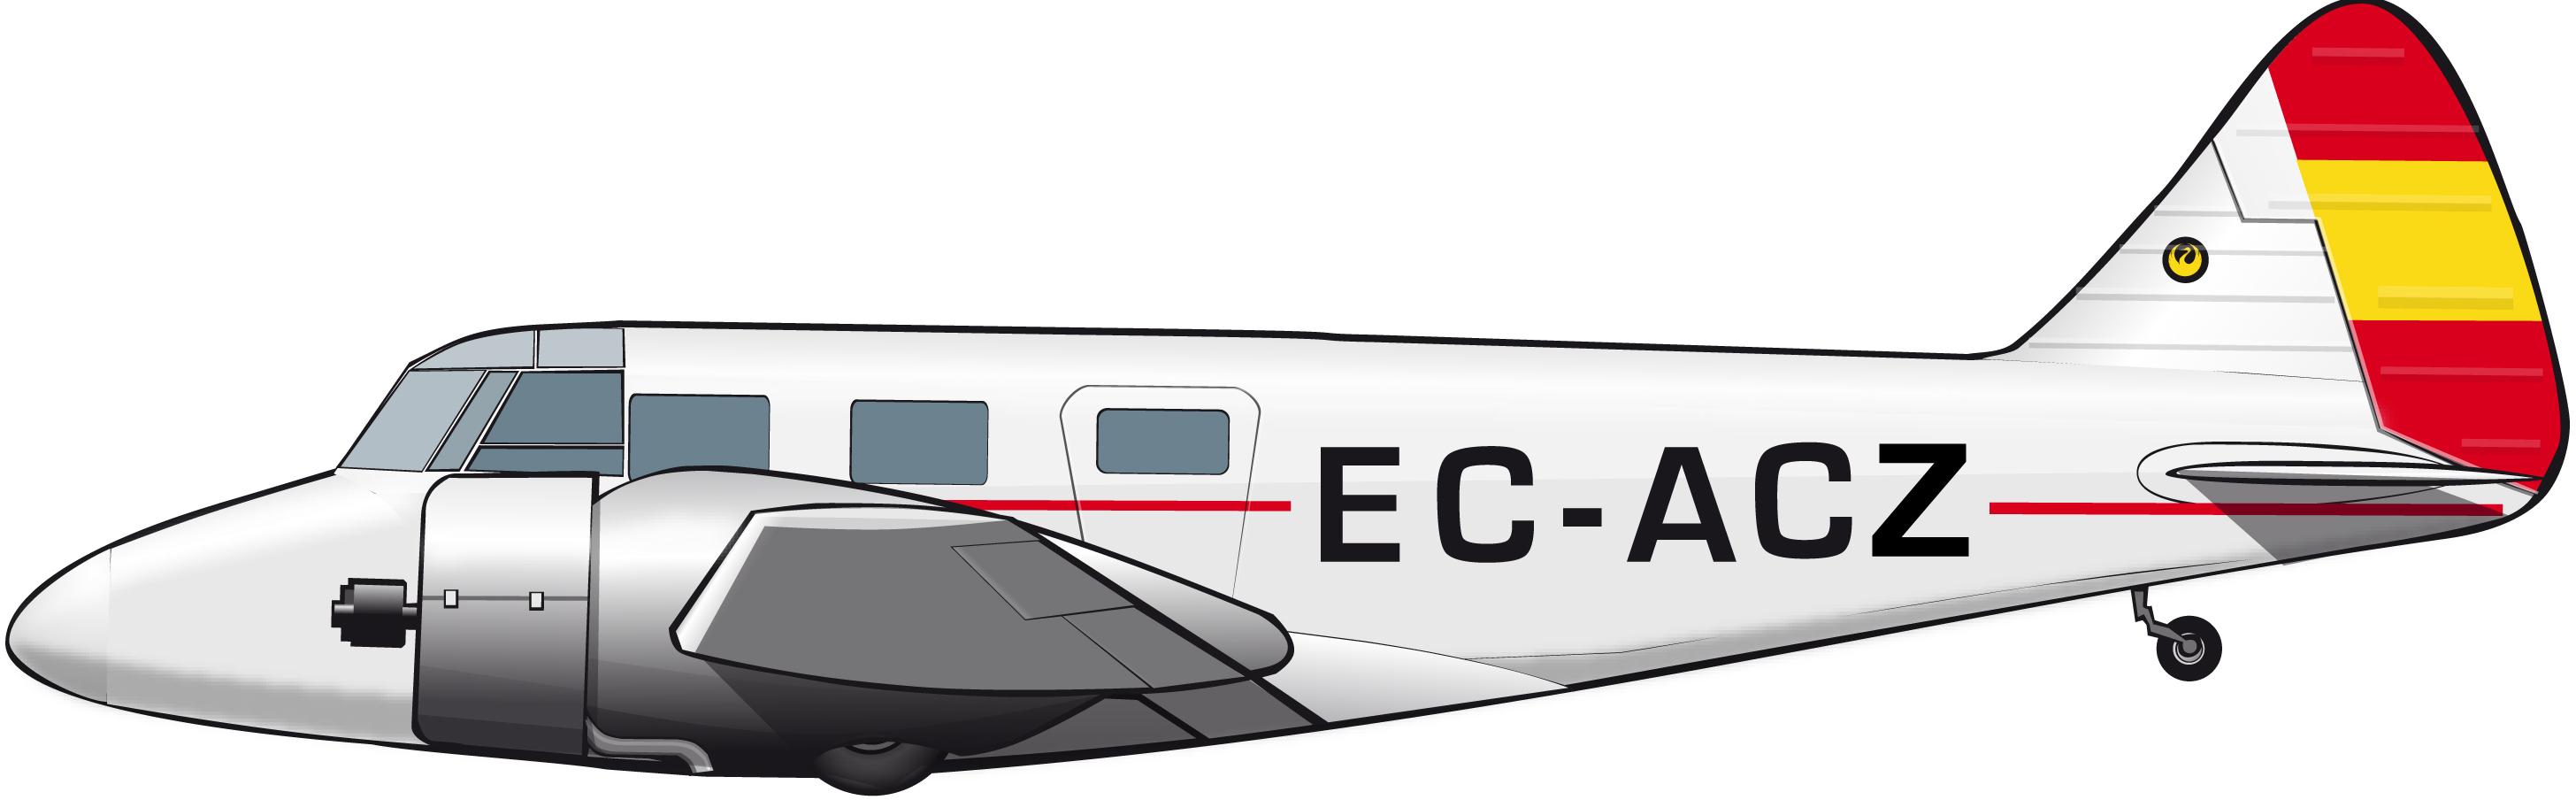 airspeedconsulrace1949